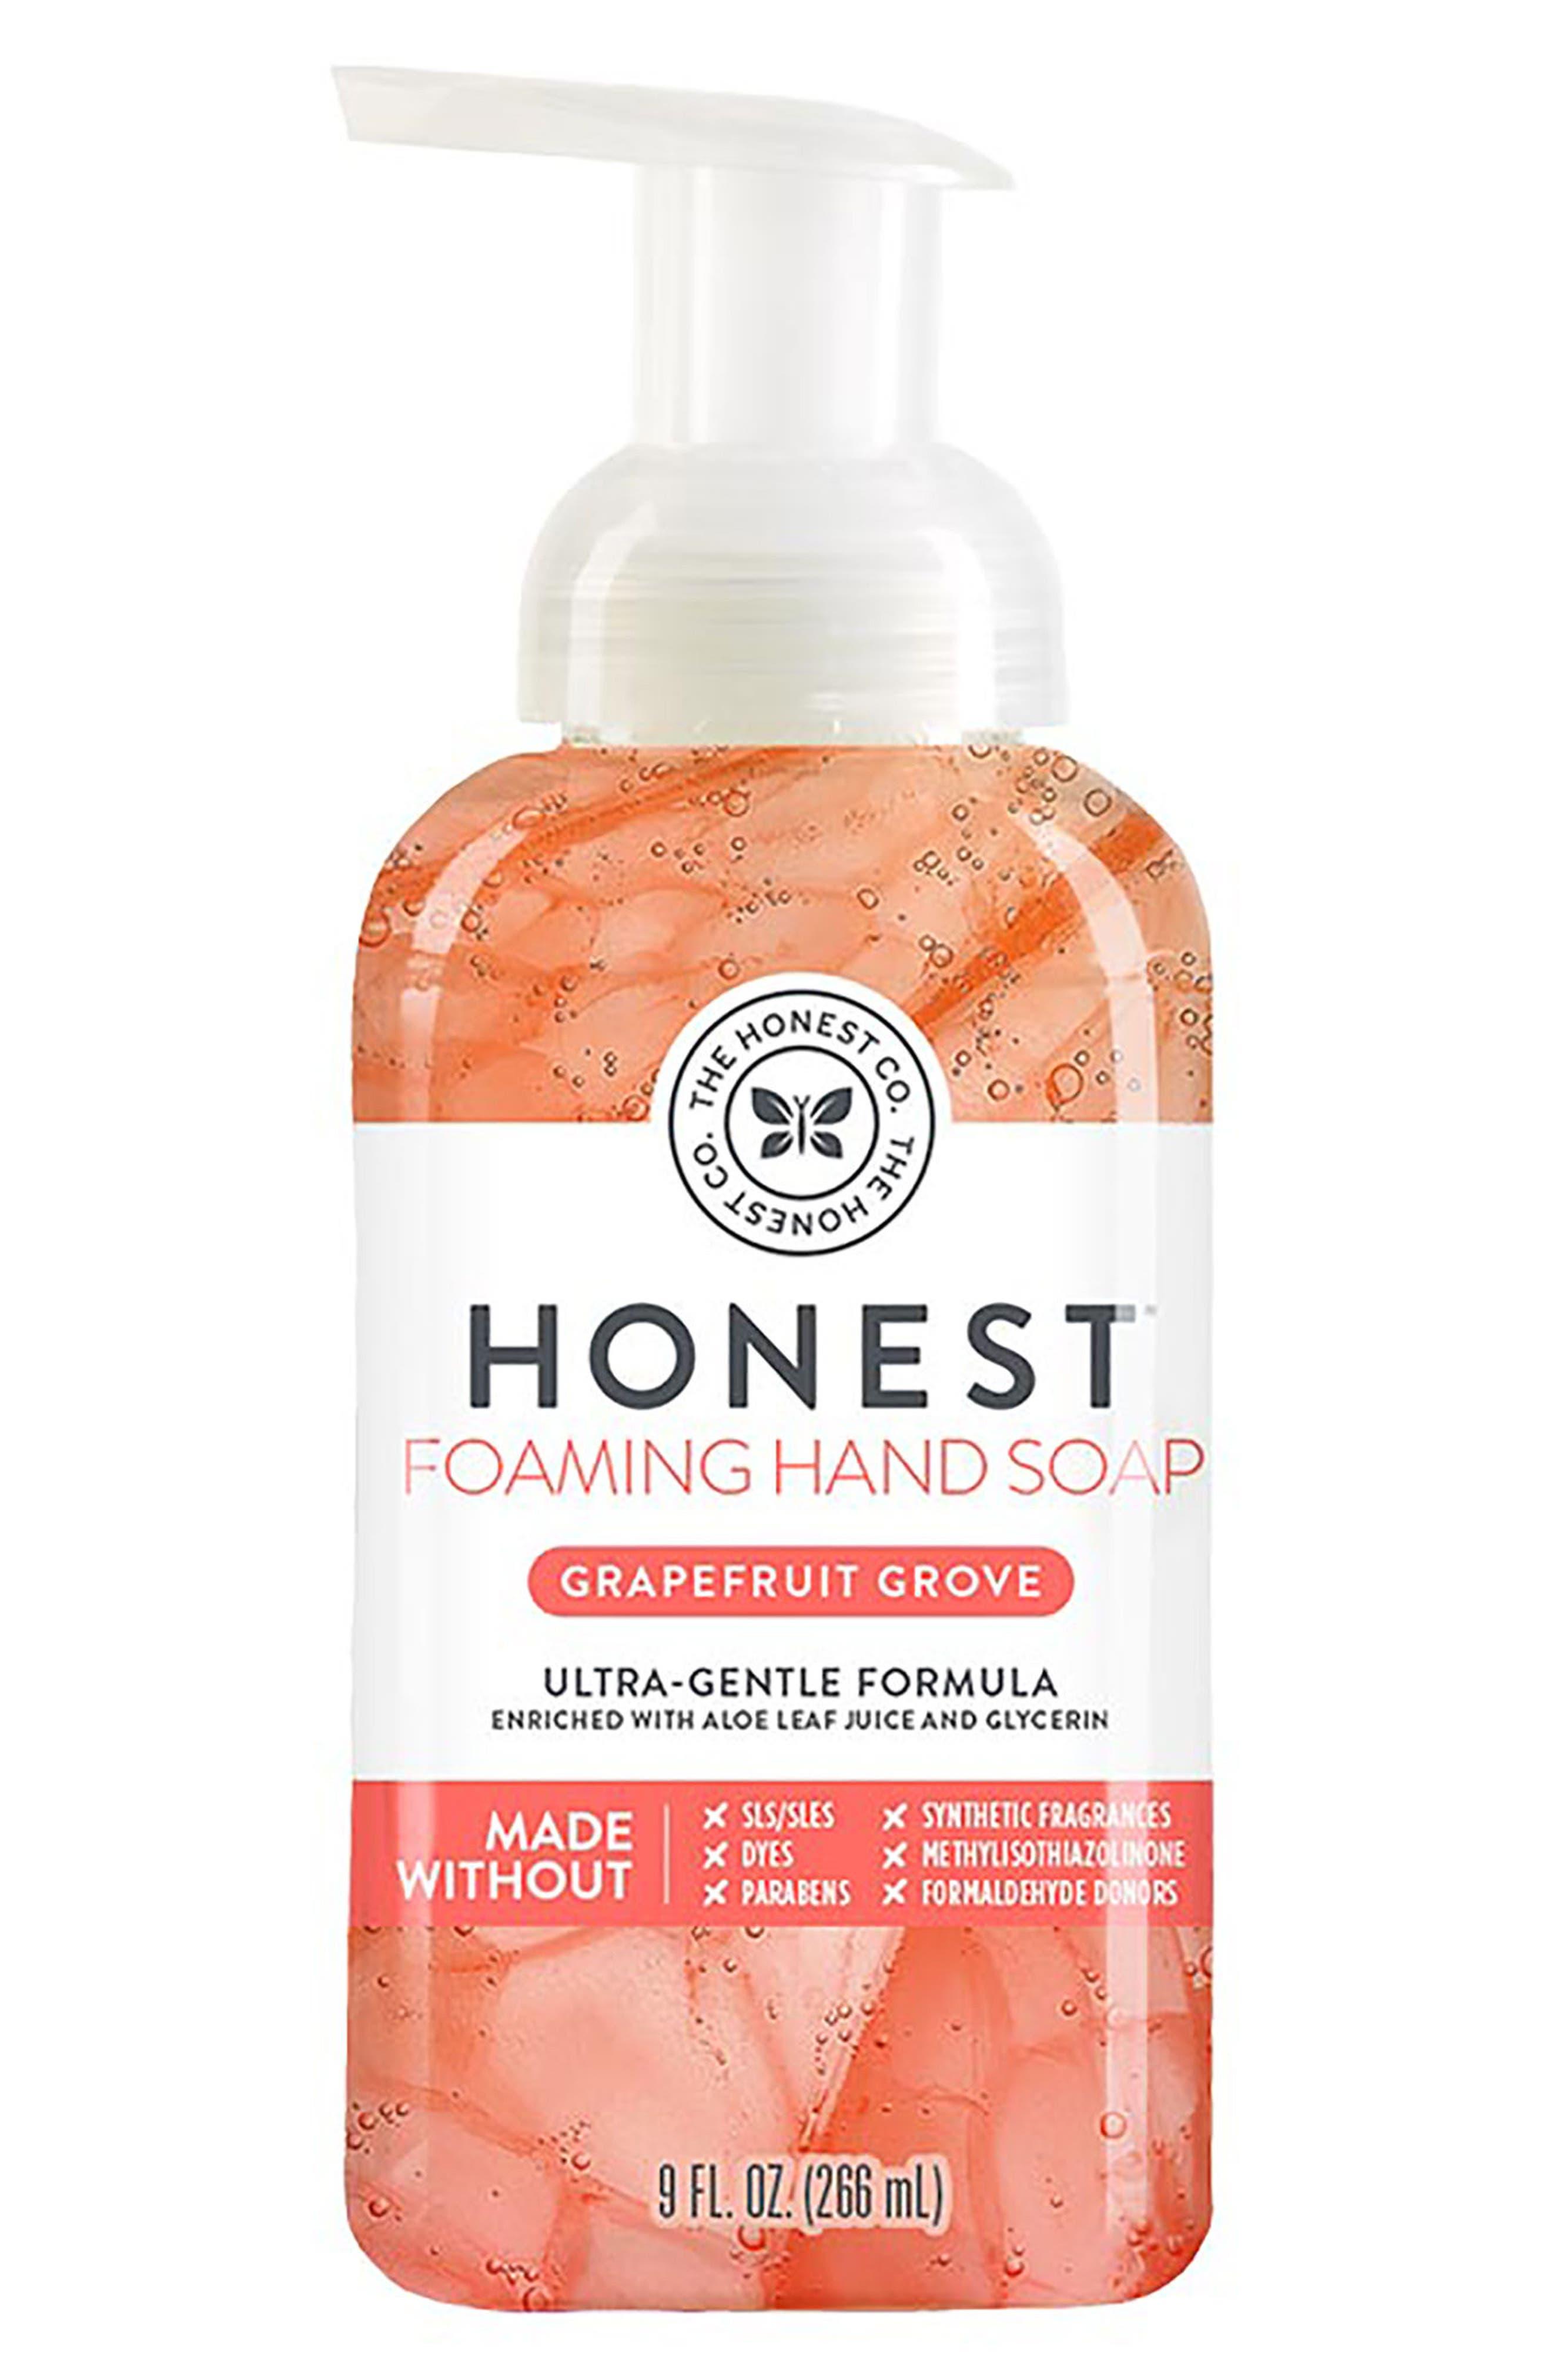 Grapefruit Grove Foaming Hand Soap,                             Main thumbnail 1, color,                             GRAPEFRUIT GROVE